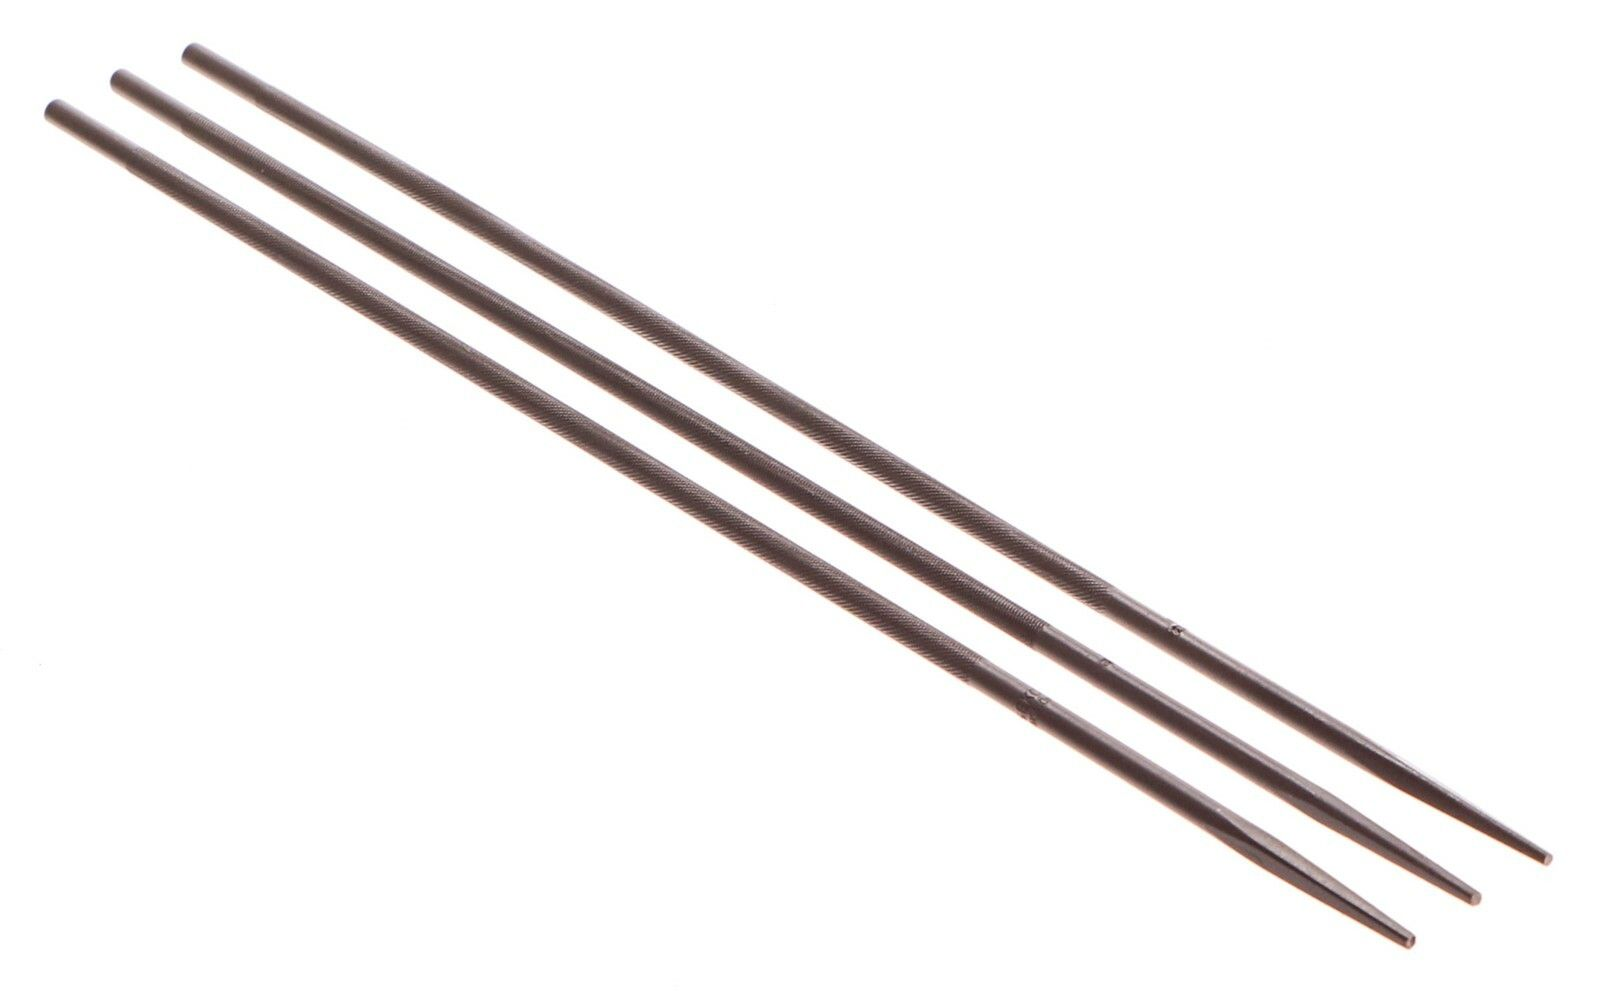 Pilník pilový na řetěz, sada 12ks, 200x4mm, GEKO